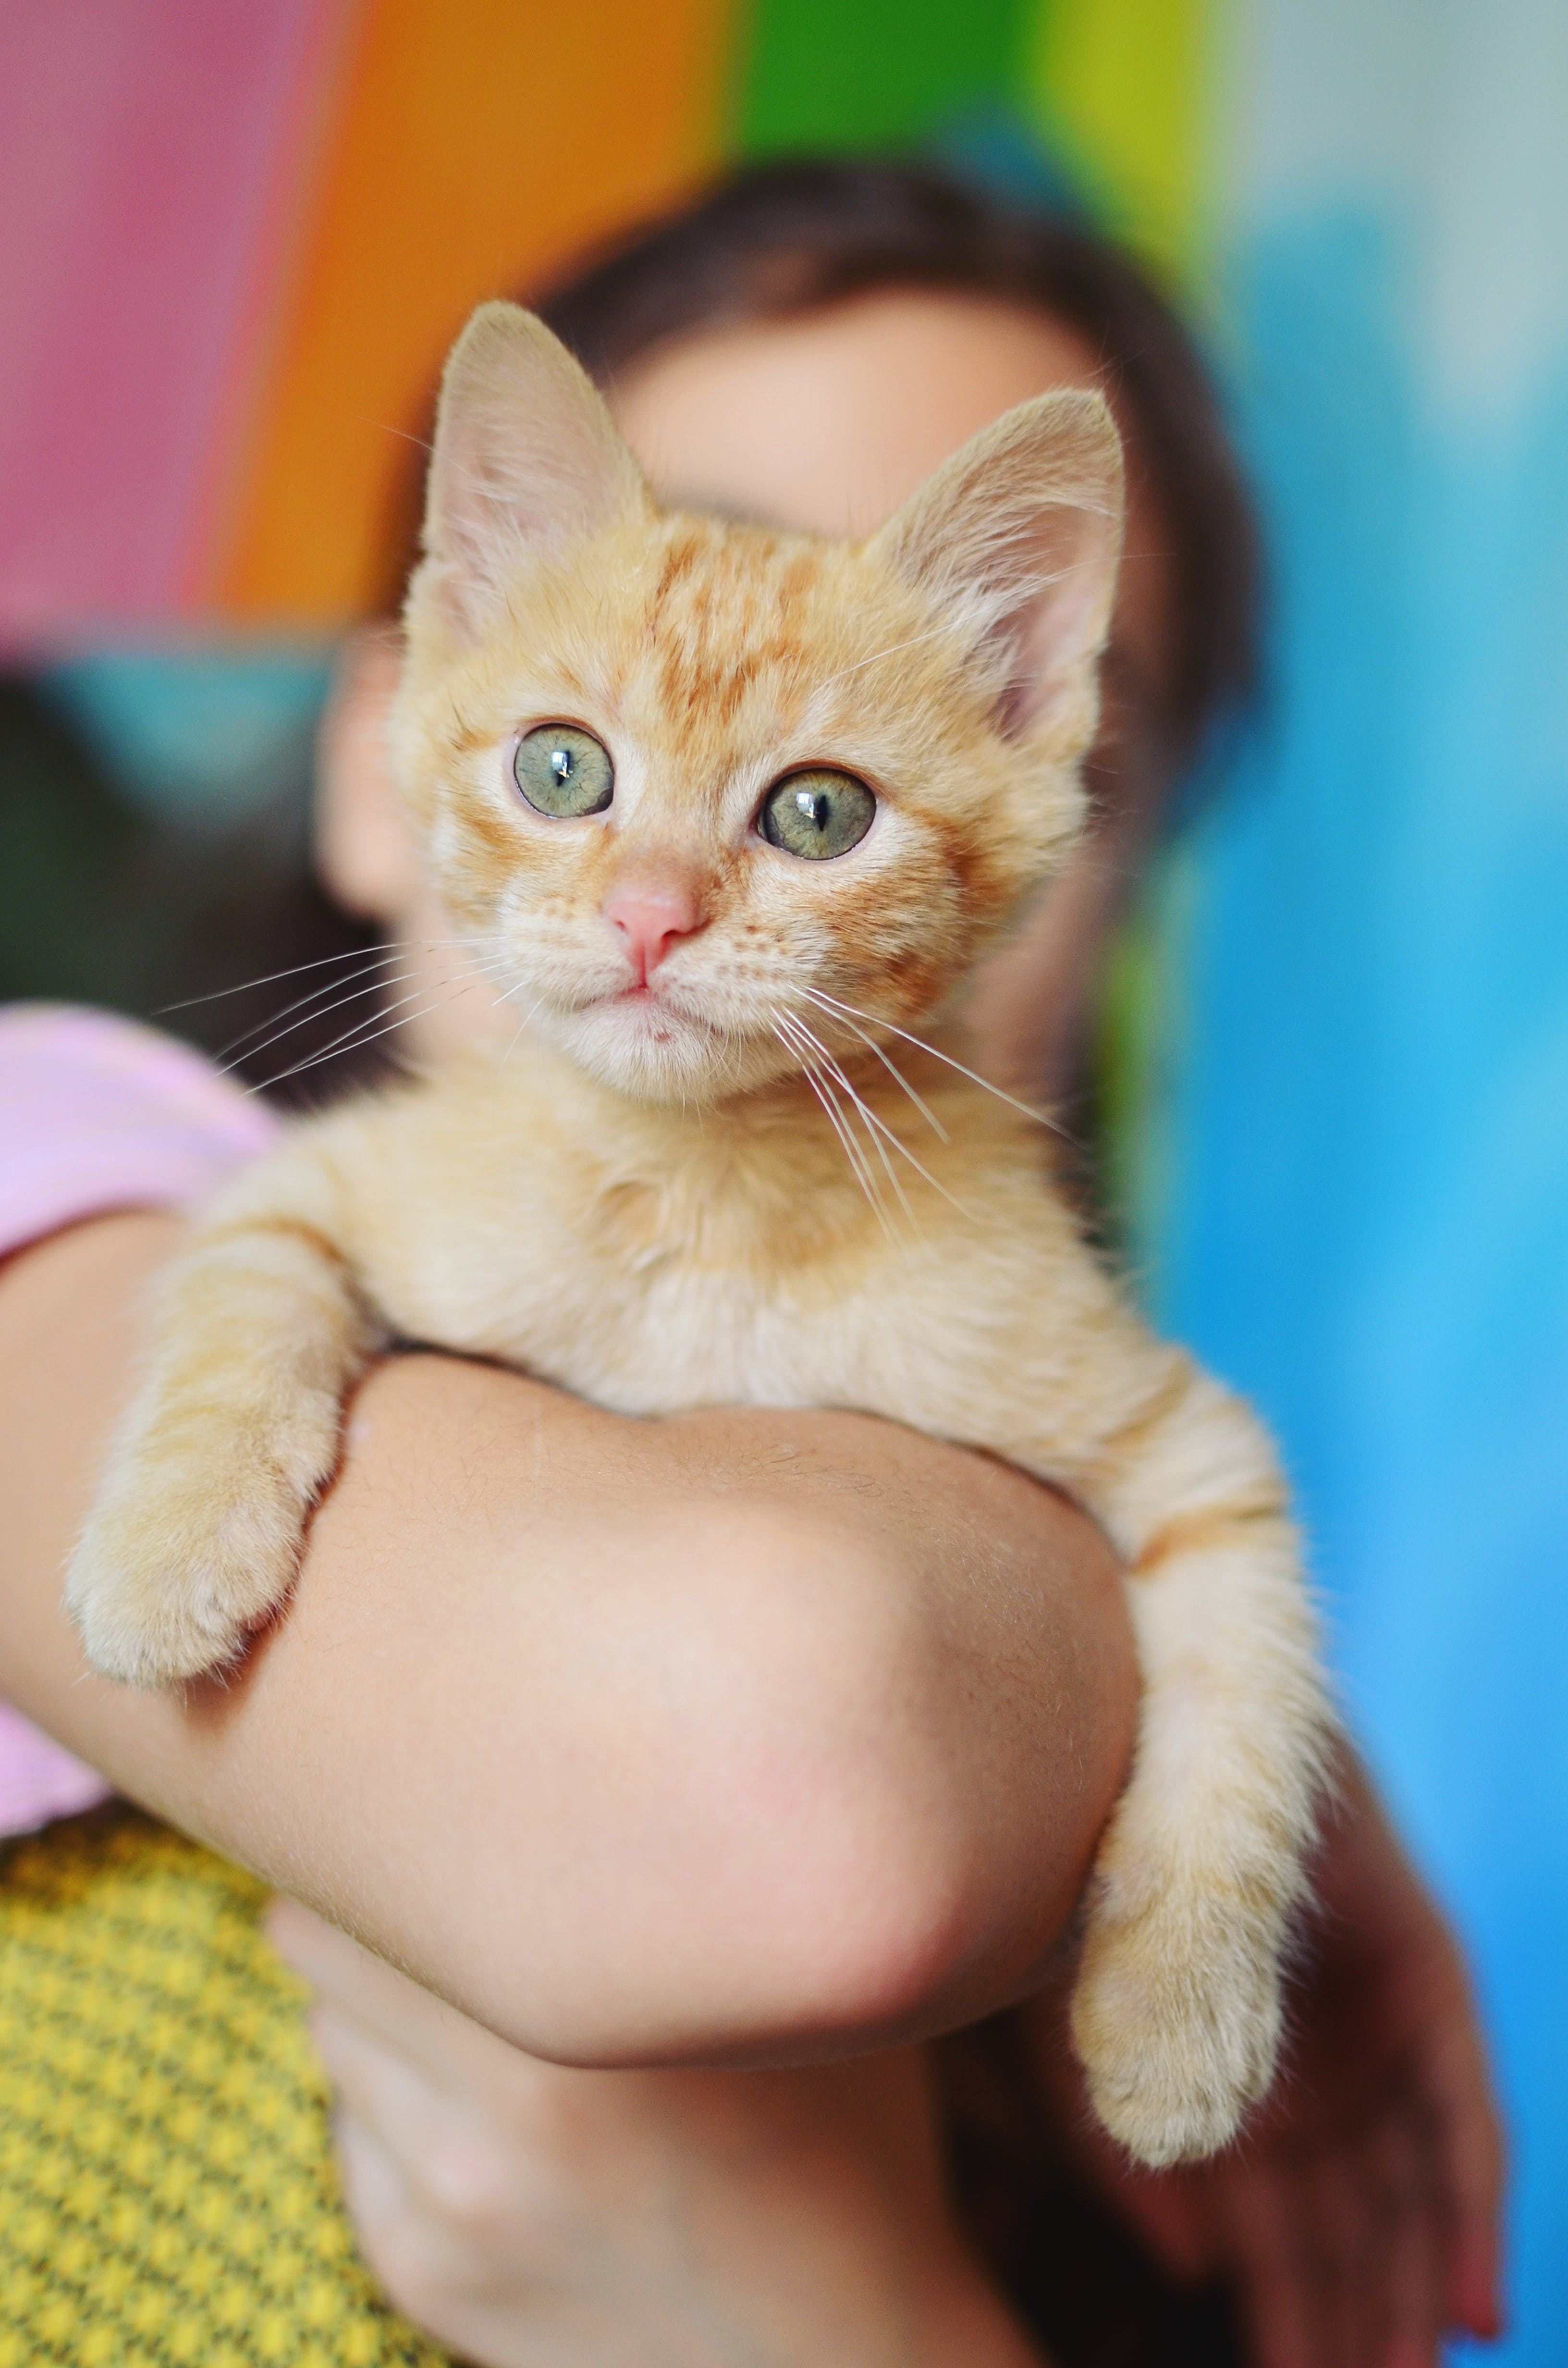 Free stock photo of colourful, cute, kitten, orange